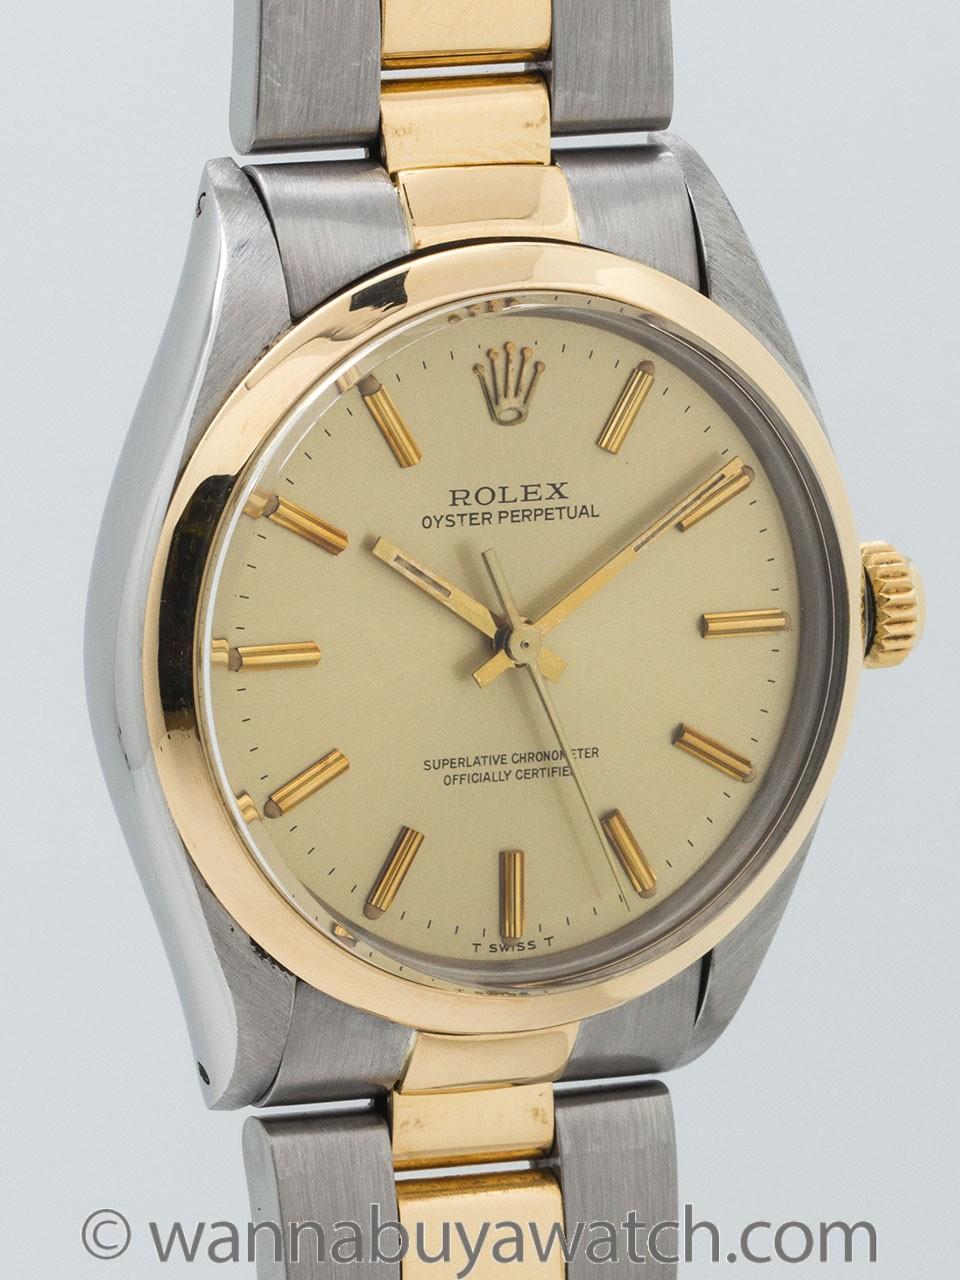 Rolex Oyster Perpetual SS/18K YG ref 1005 circa 1983